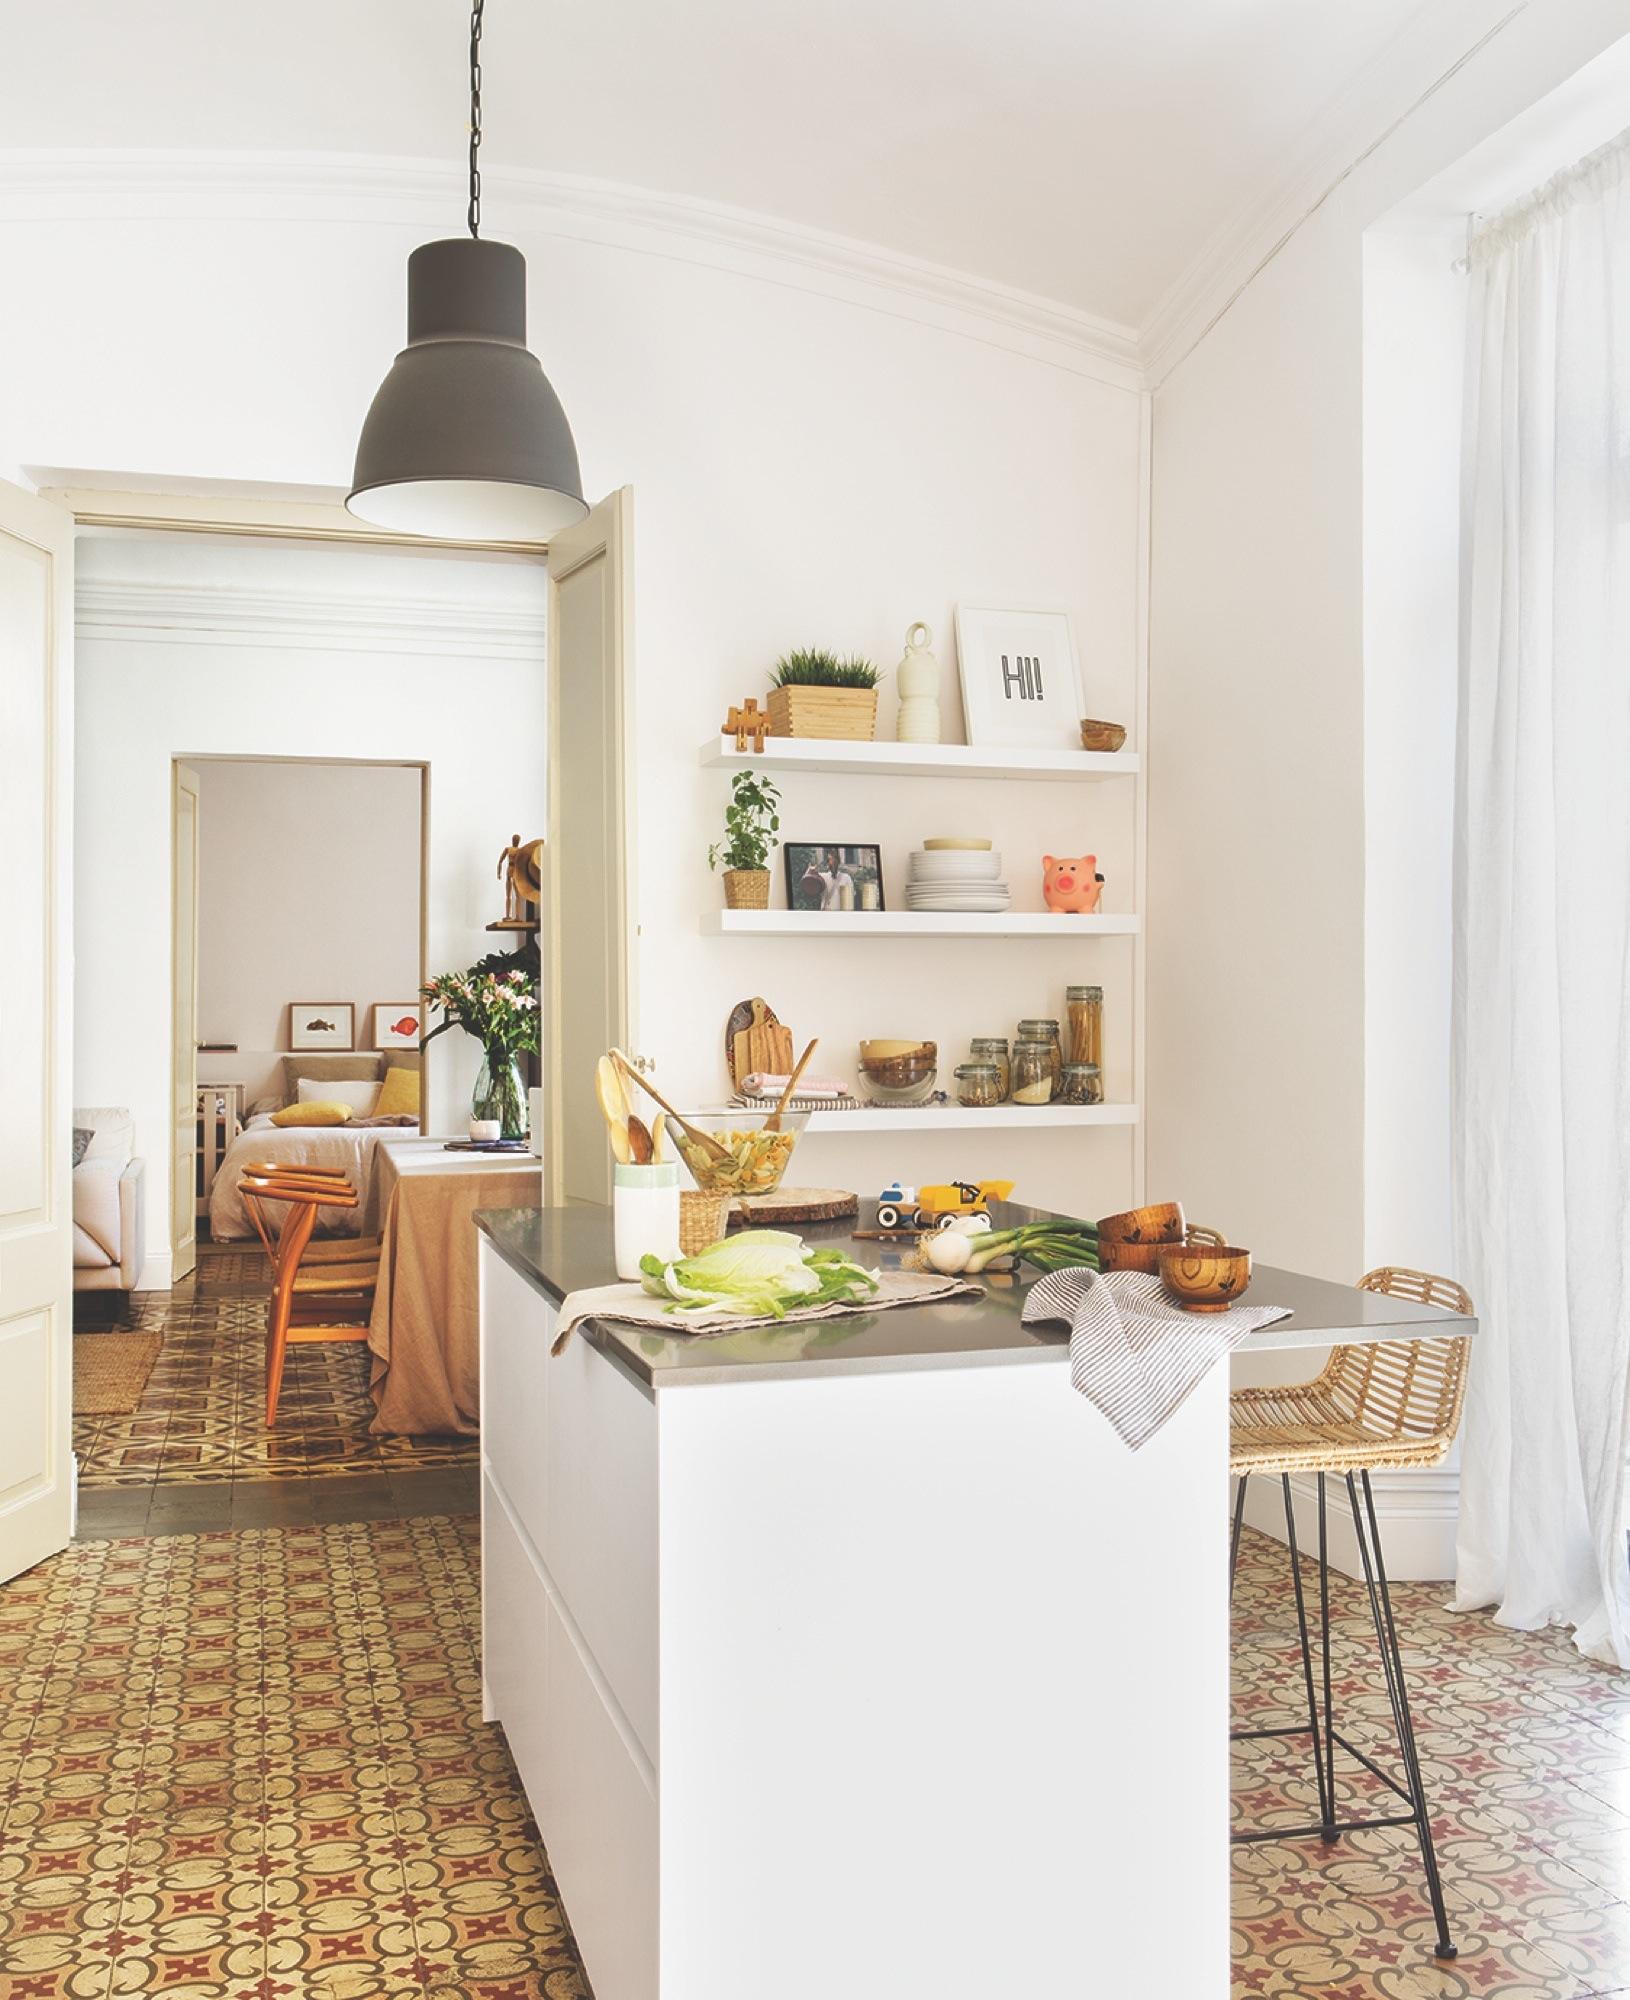 Sofá Soft Rock proyecto de interiorismo Gems Barcelona - cocina 3